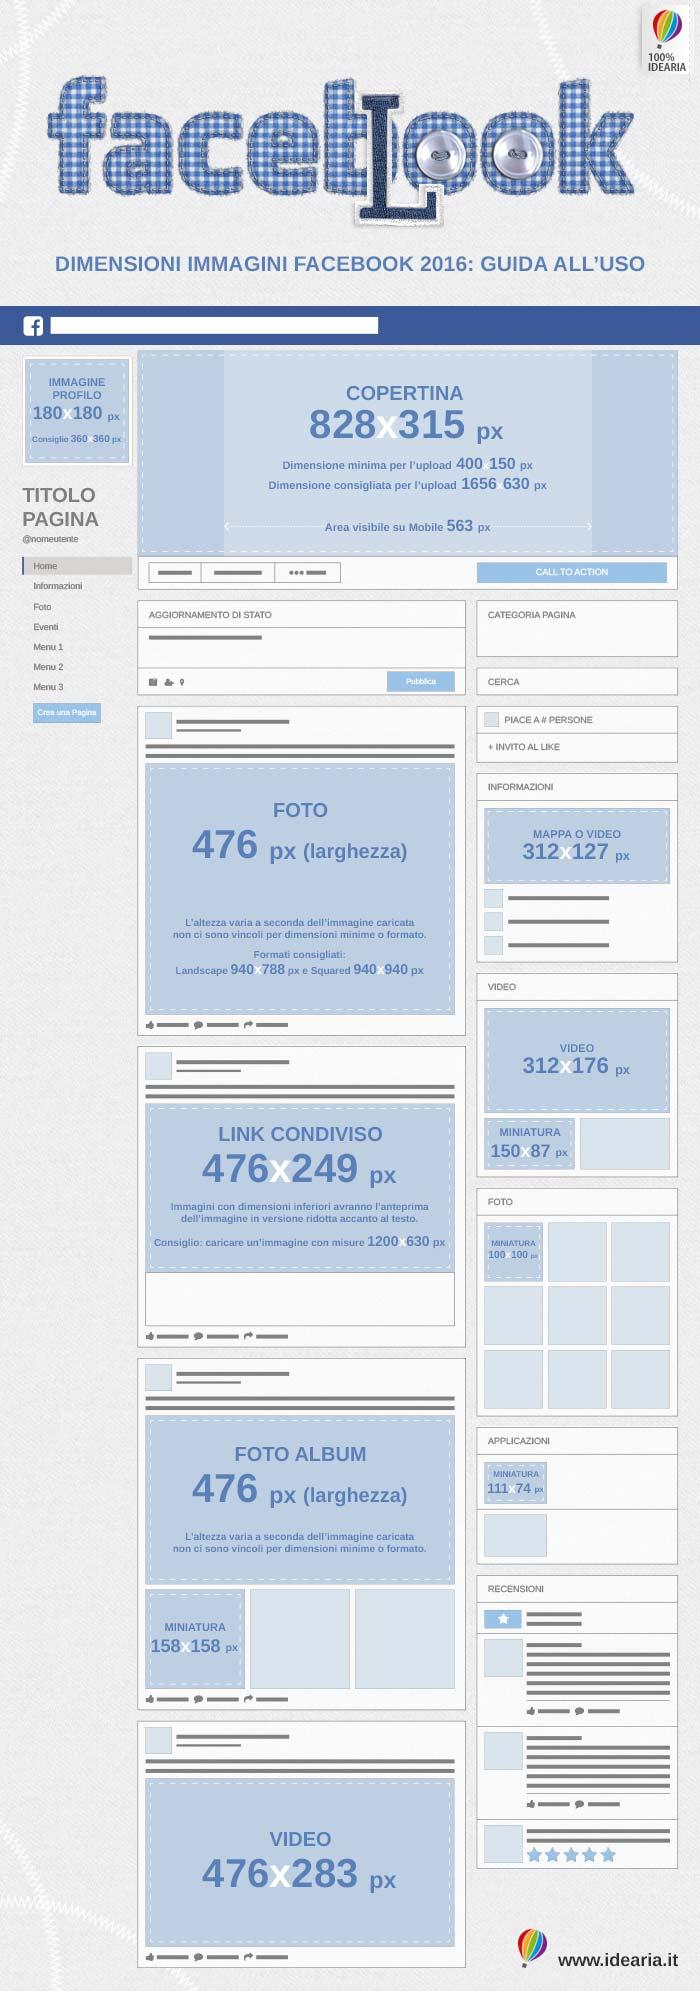 dimensioni-immagini-pagina-facebook-2016